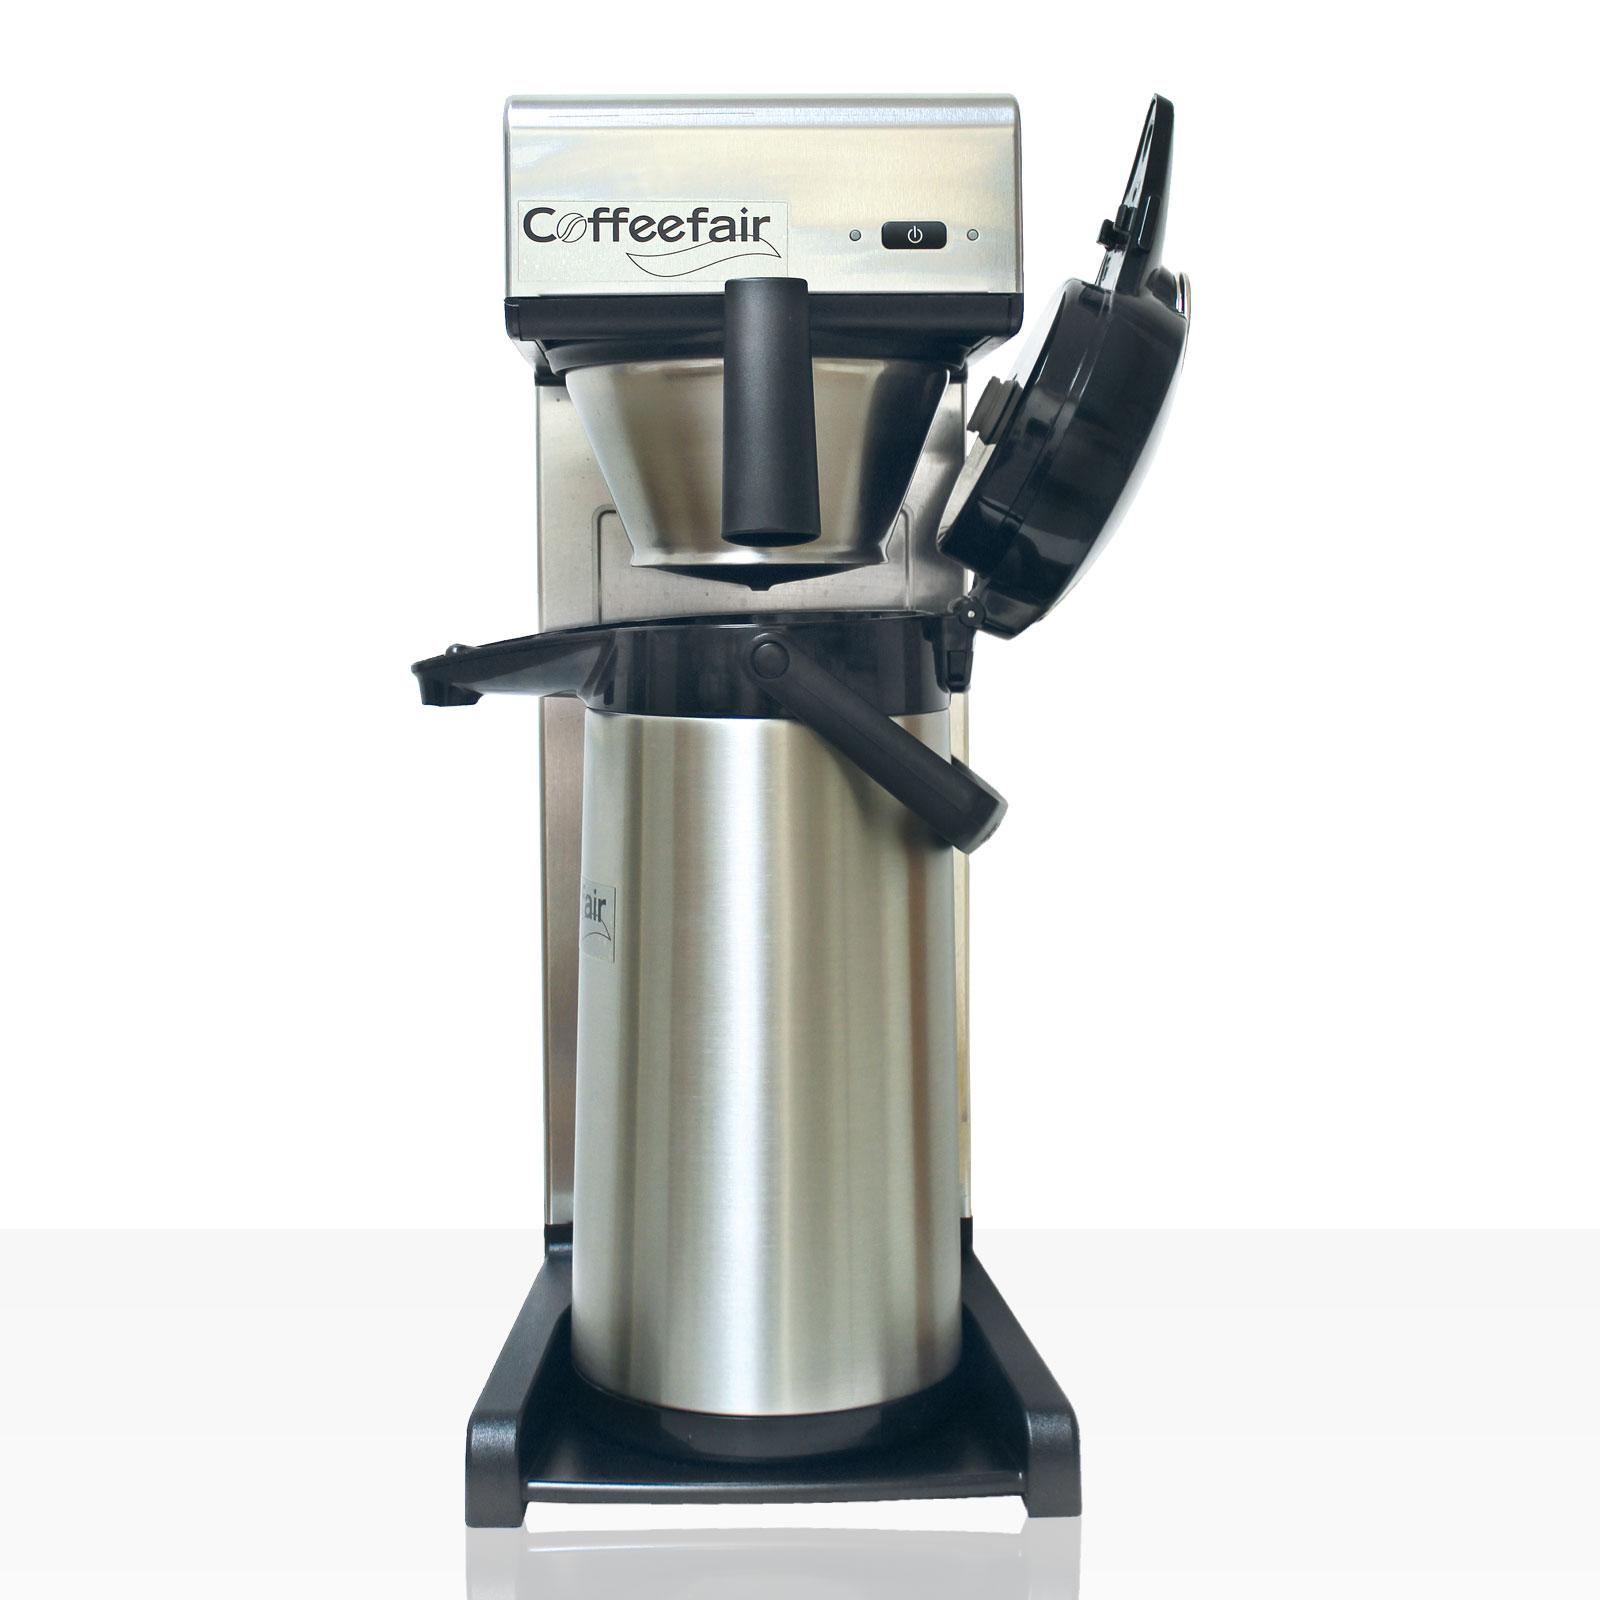 Bonamat TH Kaffeemaschine Coffeefair inkl. Pumpkanne mit Edelstahleinsatz 2,2l